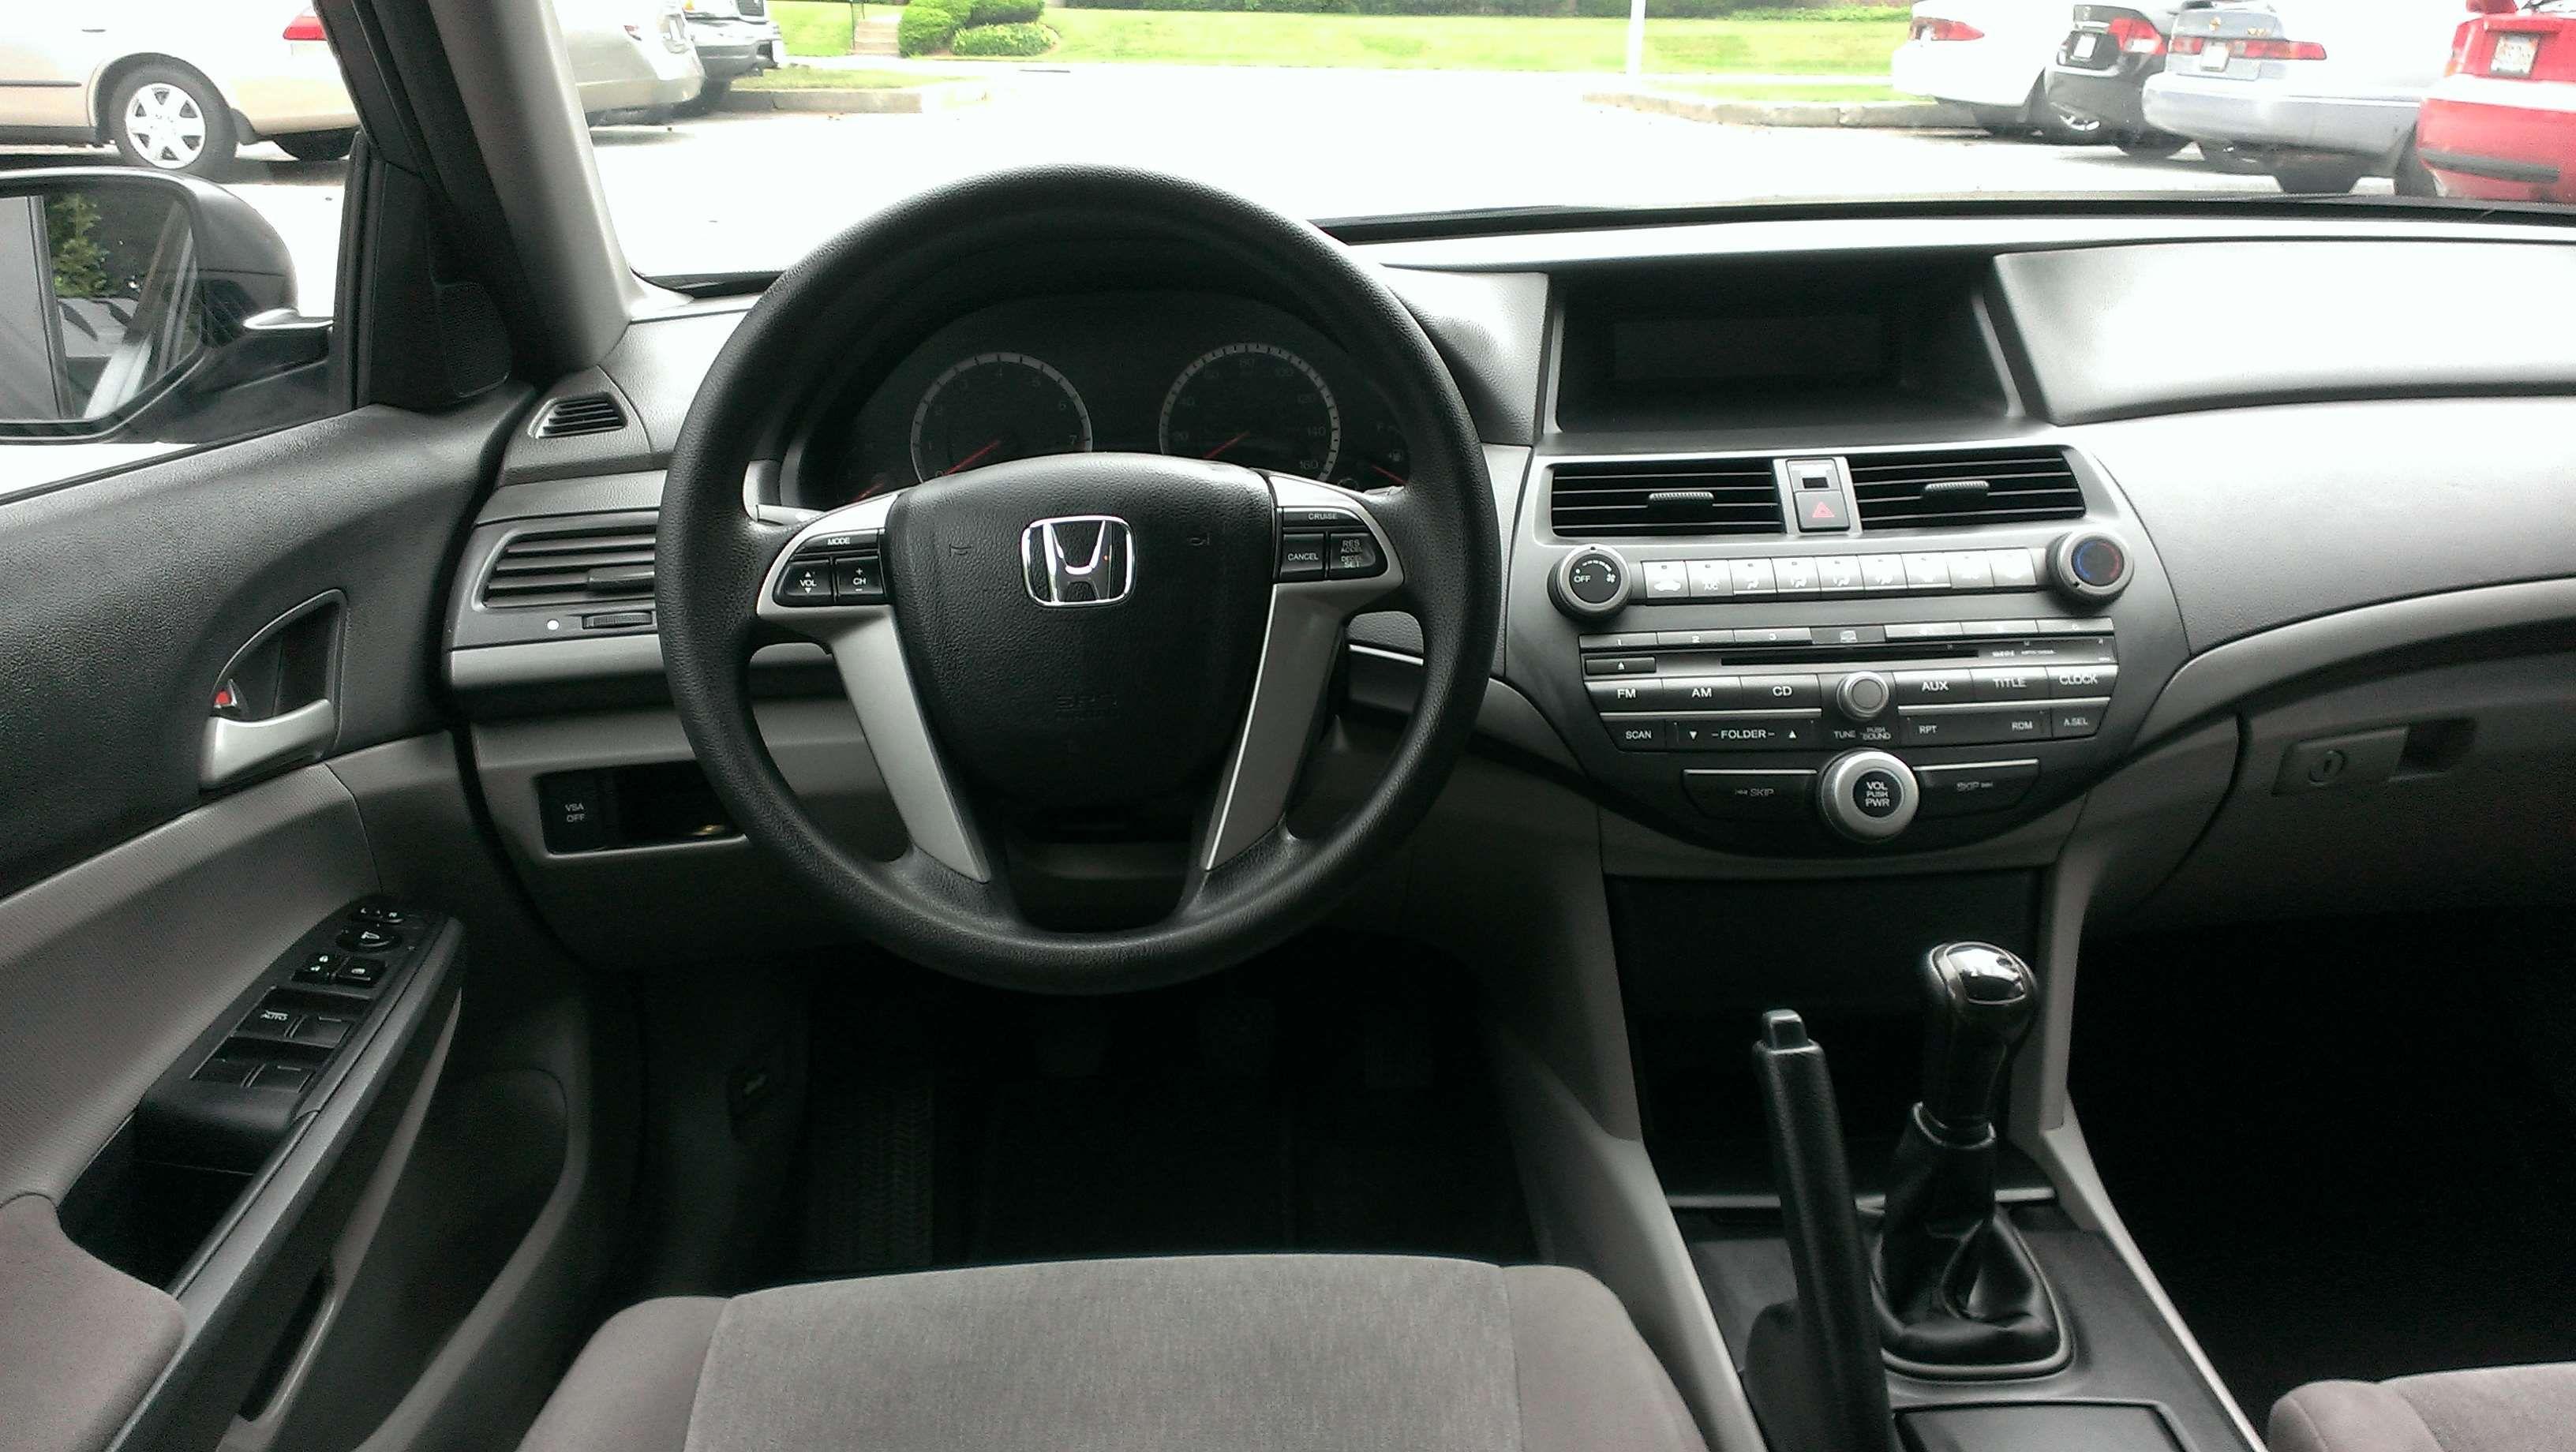 Make: Honda Model: Accord Year: 2010 Body Style: Sedan Exterior Color: